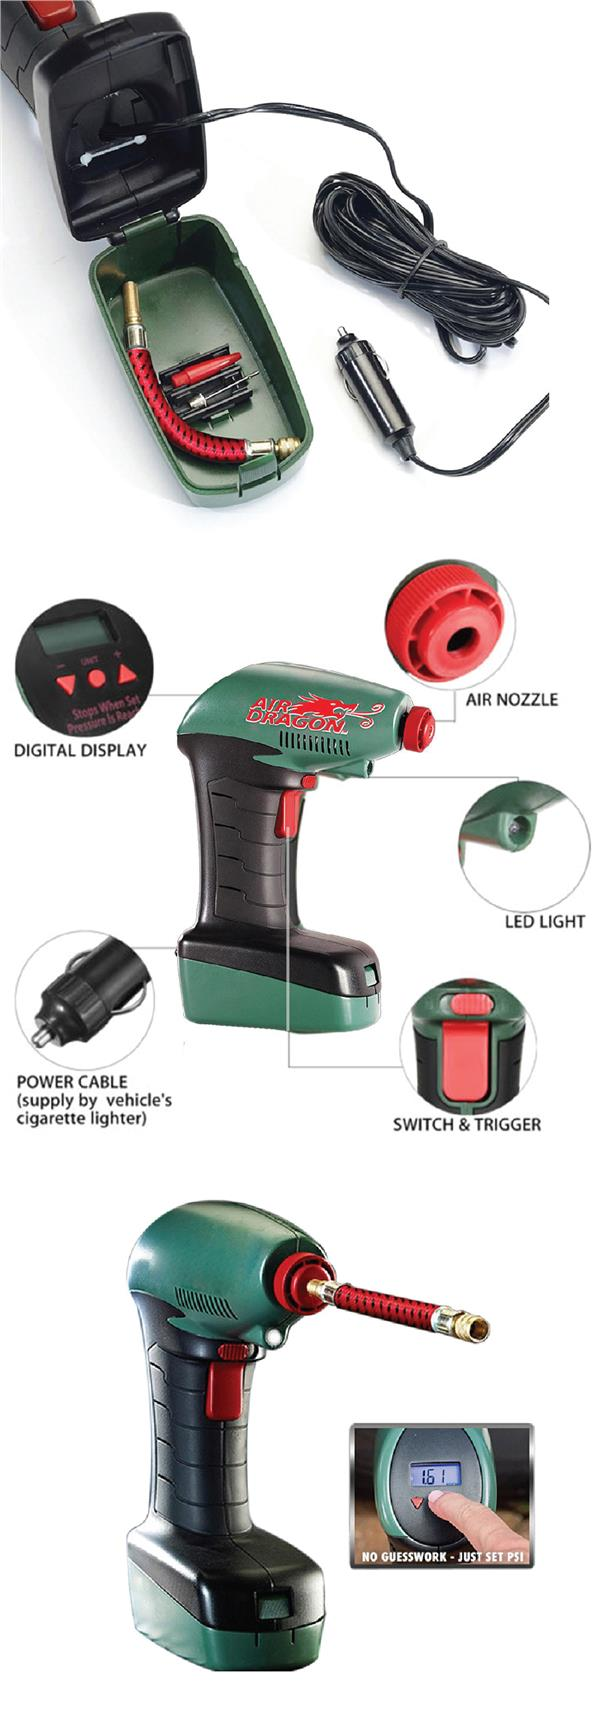 Air Dragon Portable Air Compressor Inflator Emergency Pump Auto Stop